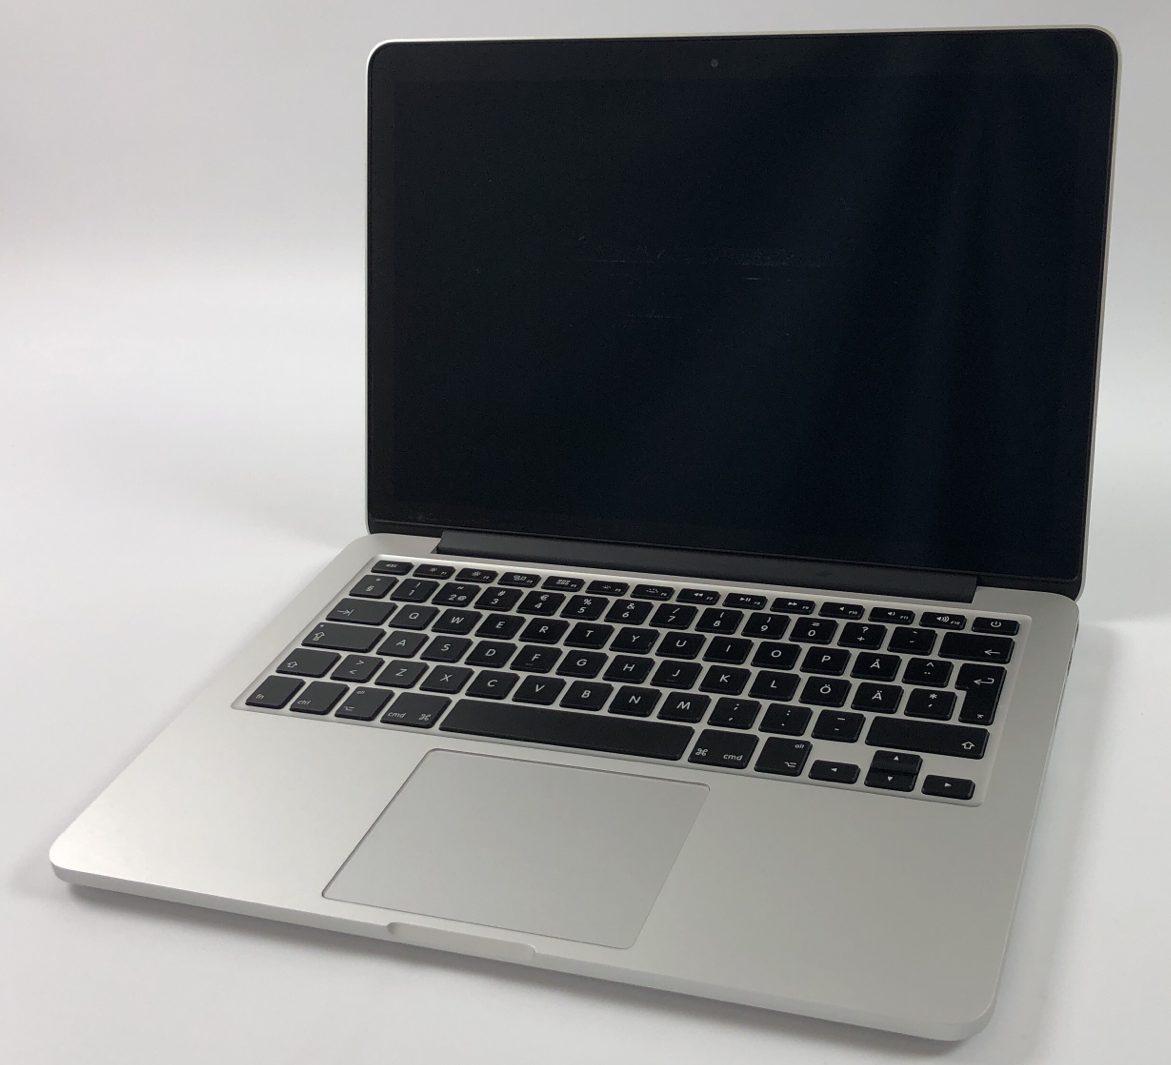 "MacBook Pro Retina 13"" Early 2015 (Intel Core i5 2.7 GHz 8 GB RAM 128 GB SSD), Intel Core i5 2.7 GHz, 8 GB RAM, 128 GB SSD, Kuva 1"